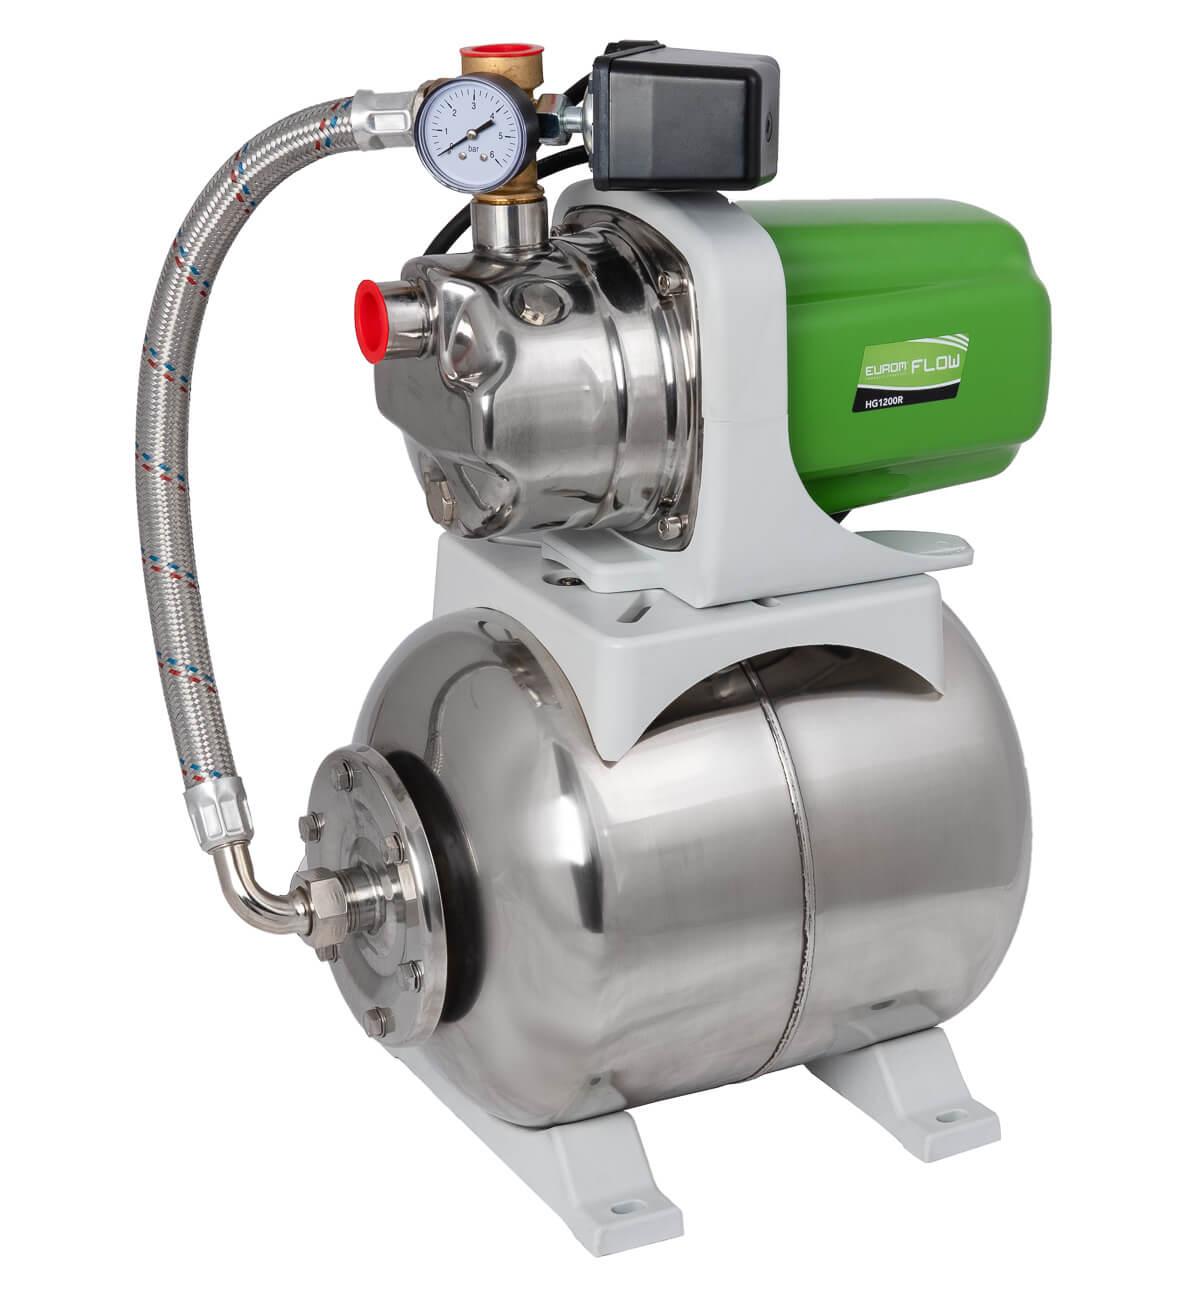 Eurom Flow HG1200R Drukpomp 1200W | Hydrofoorgroep waterpomp